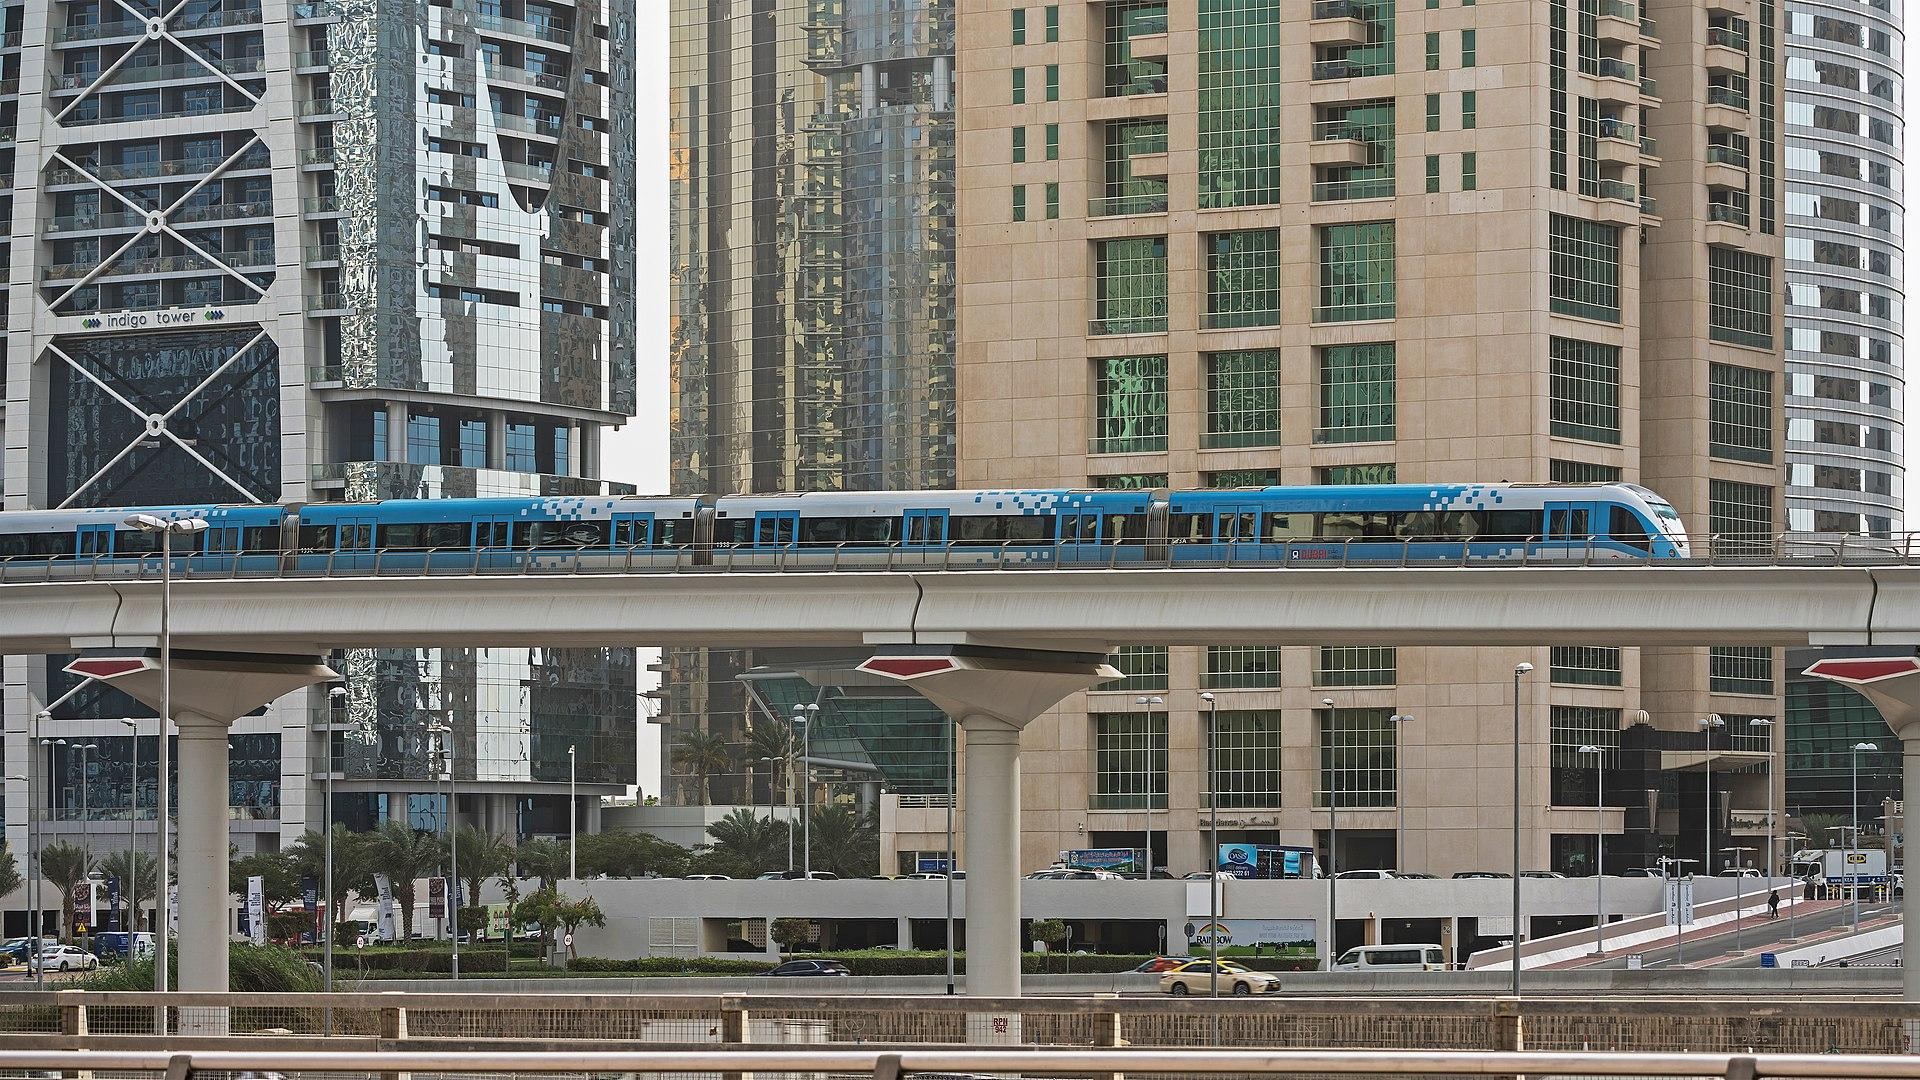 1920px-UAE_Dubai_Marina_img3_asv2018-01.